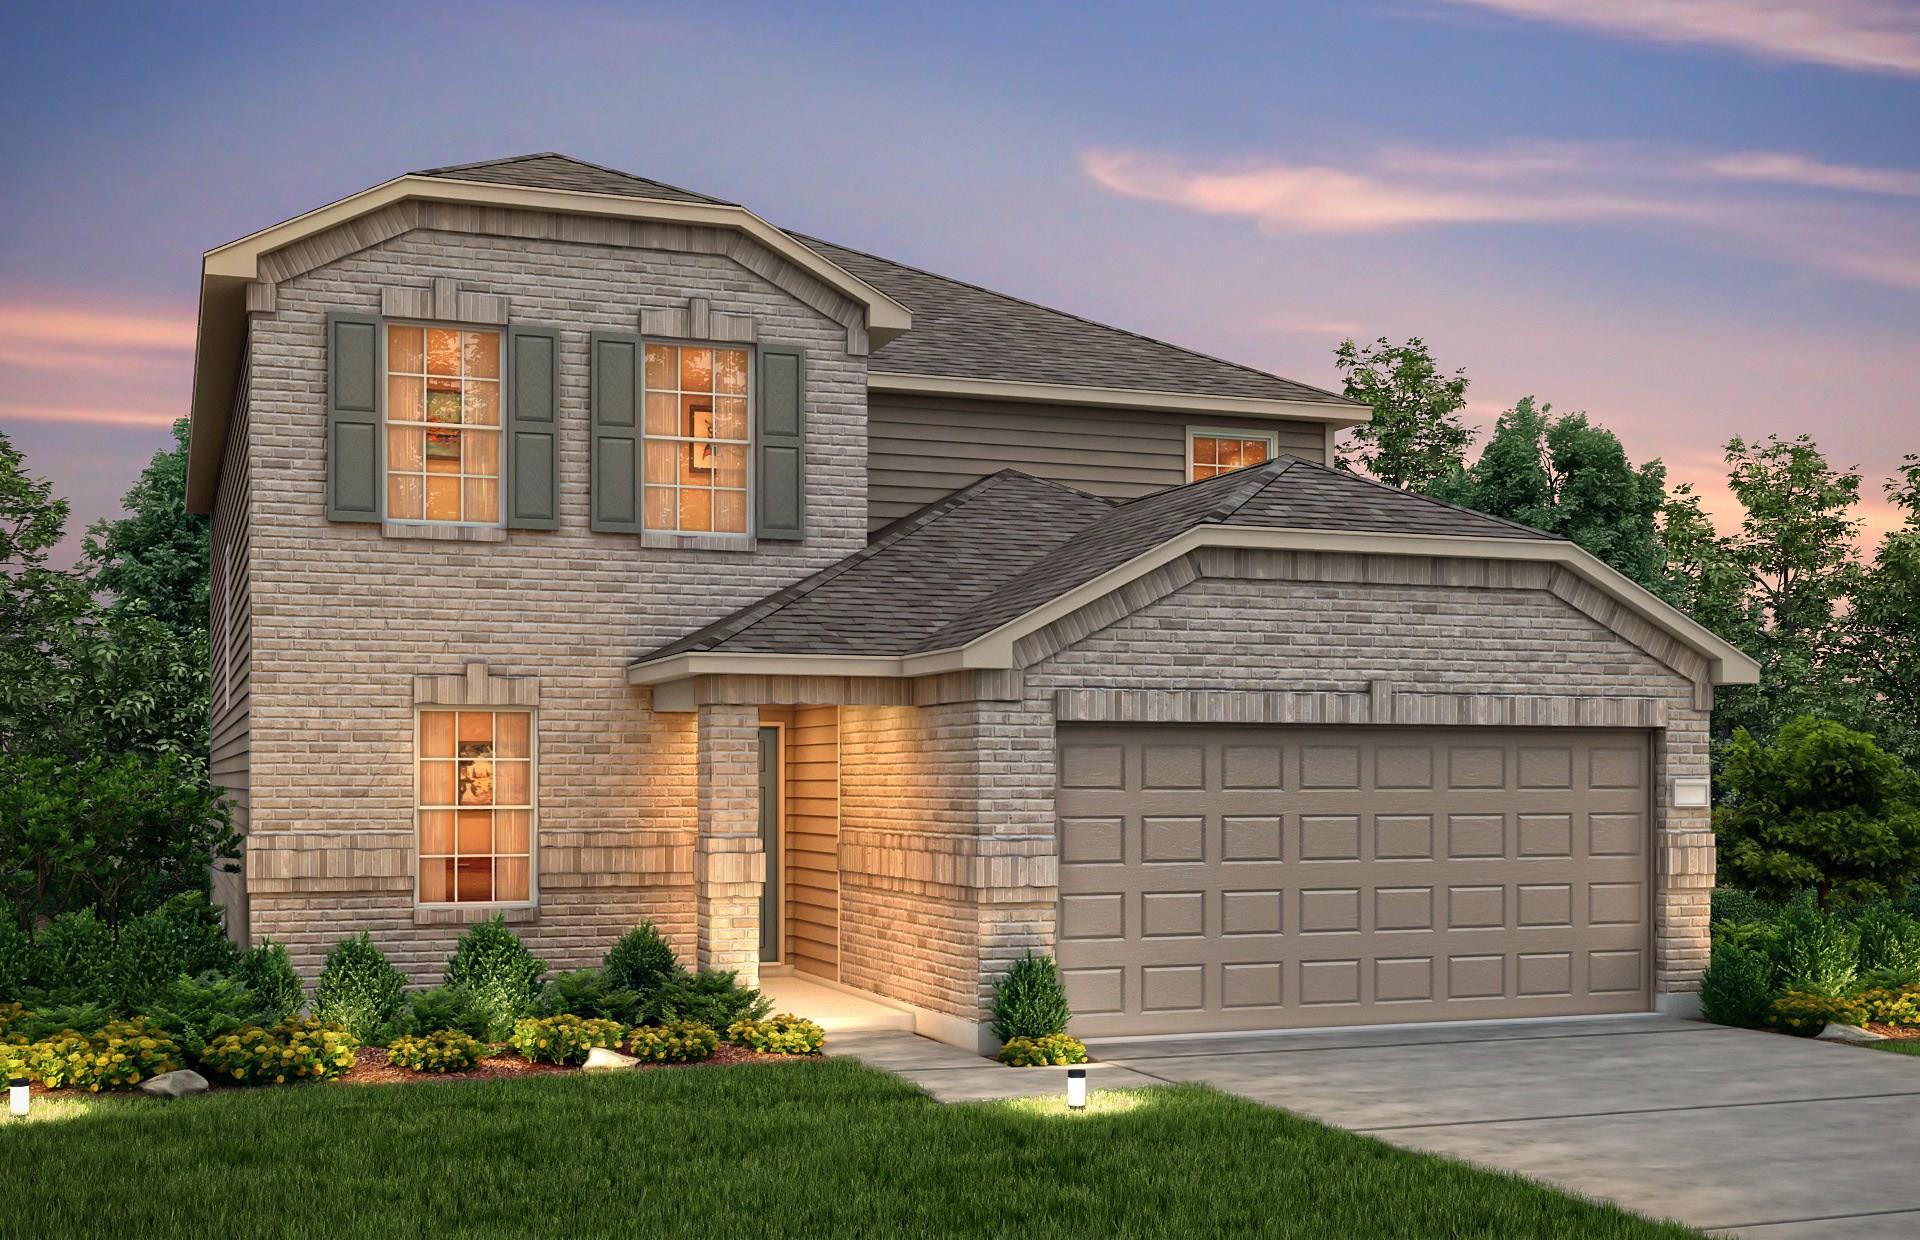 1706 Avocet Way Property Photo - Missouri City, TX real estate listing